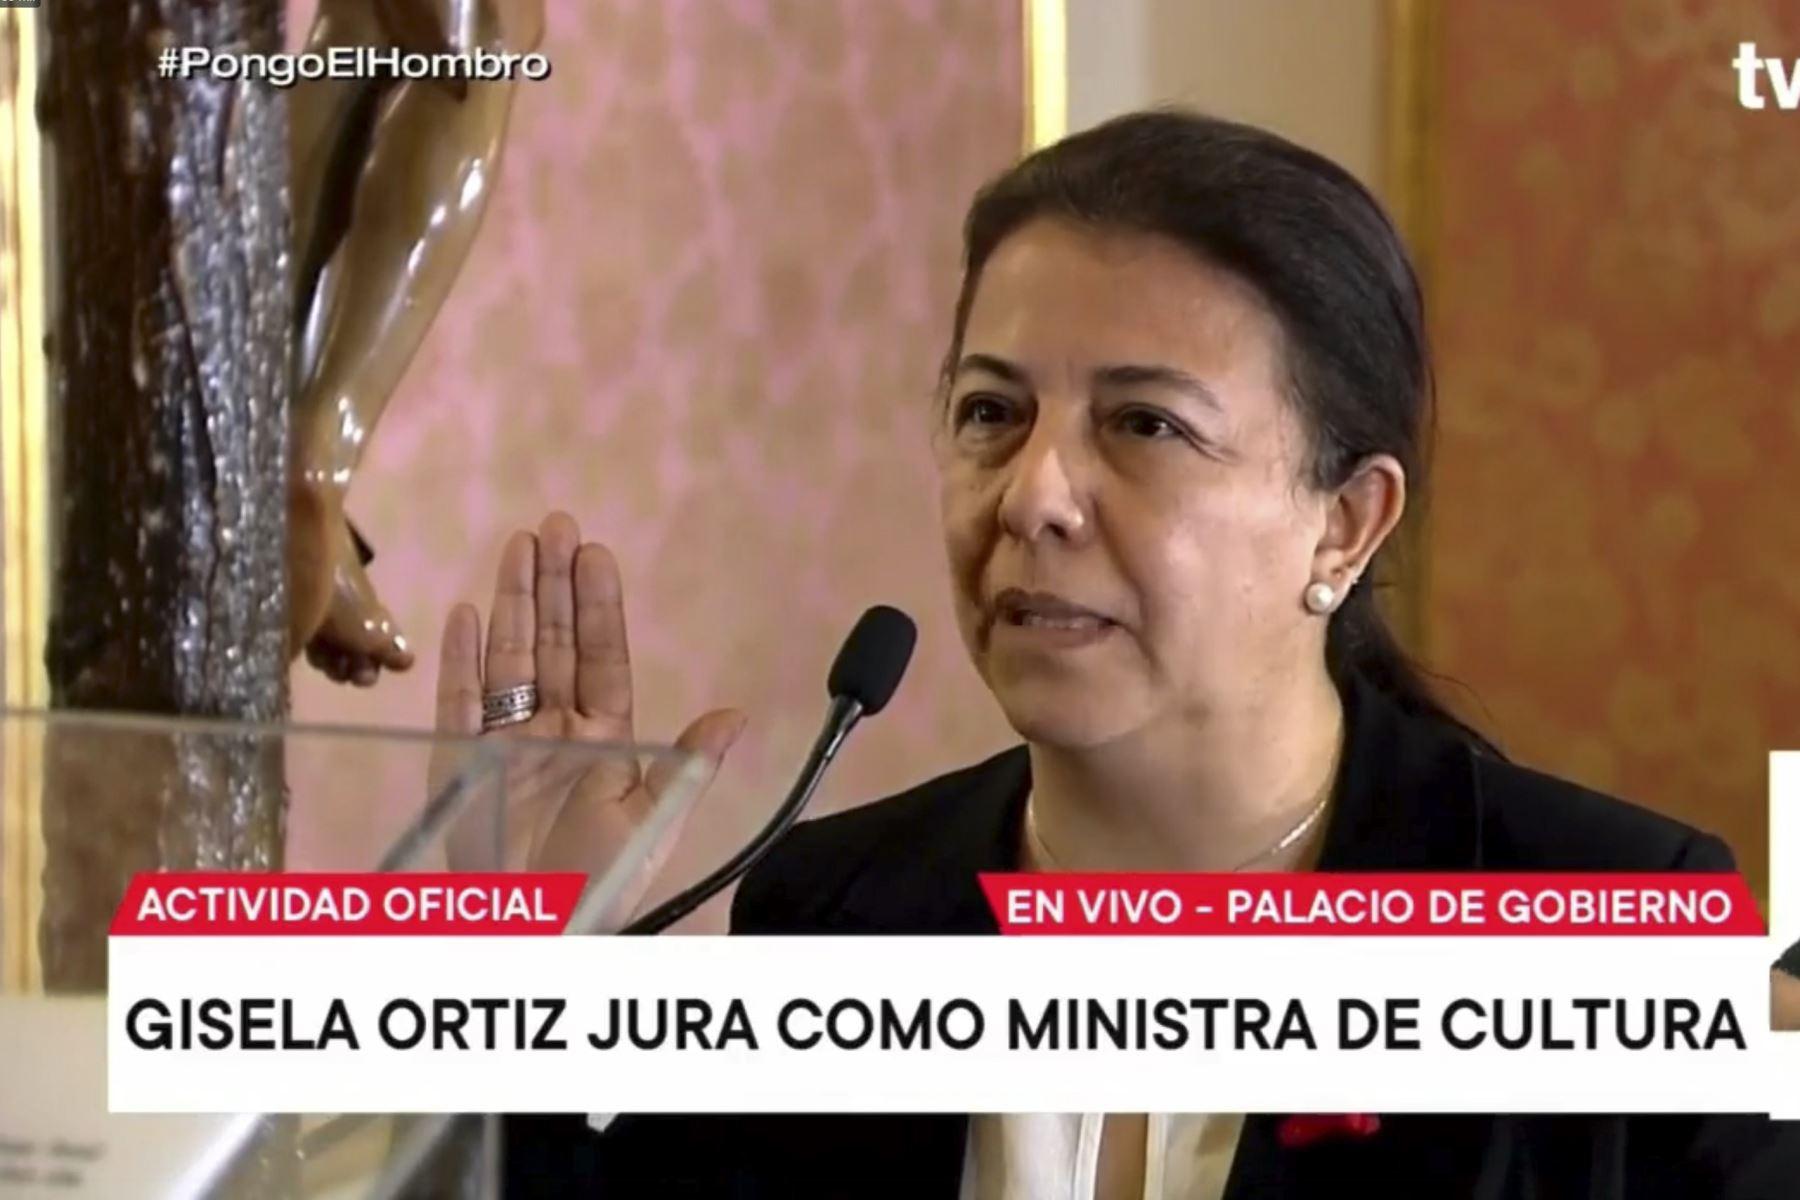 Andrea Gisela Ortiz jura como nueva ministra de Cultura